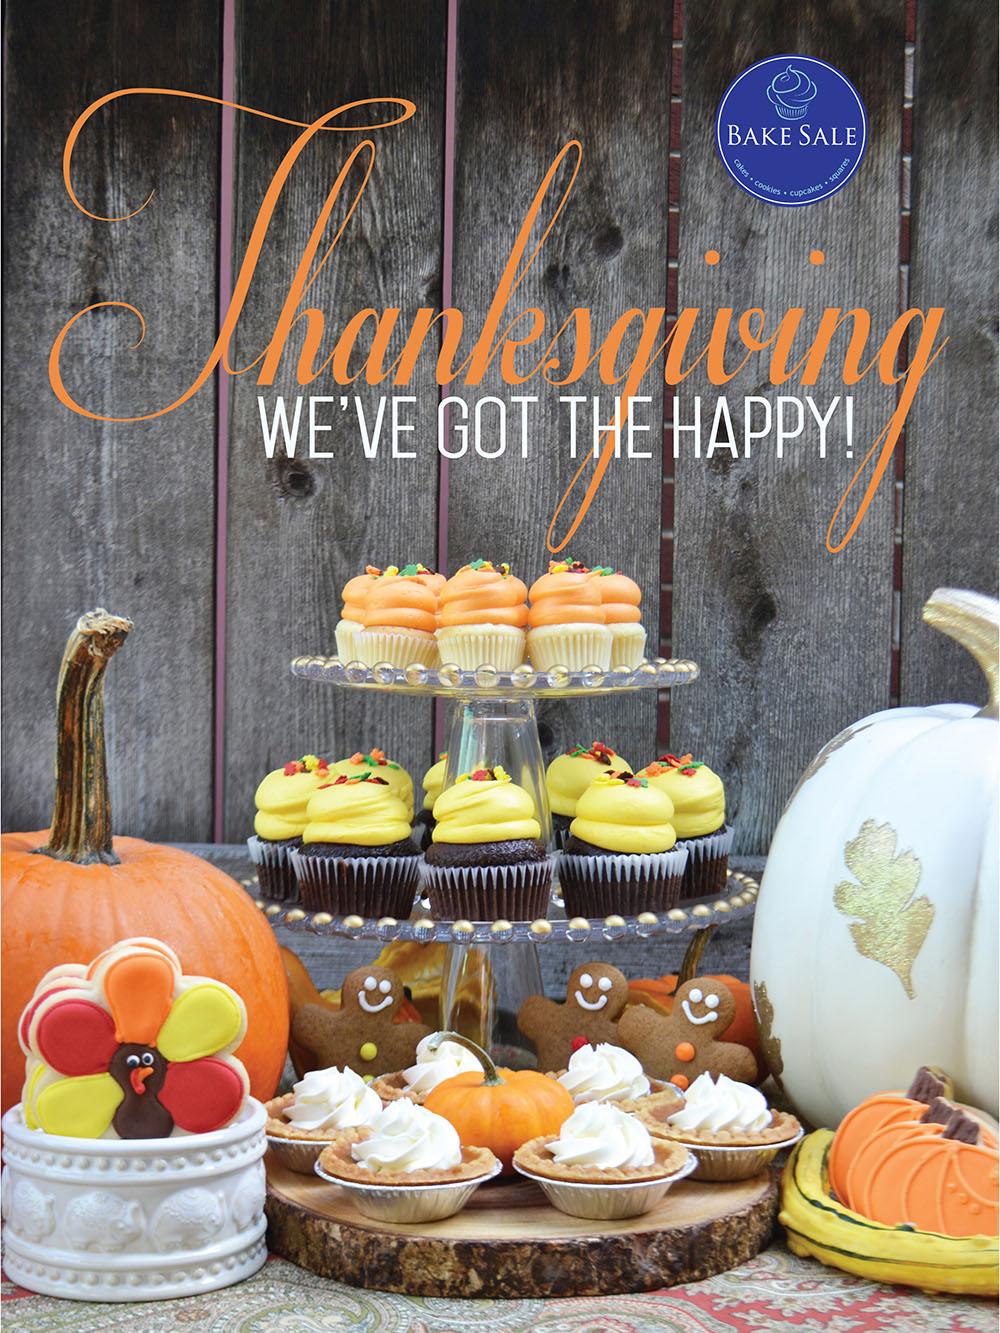 Bake-Sale-Toronto-Happy-Thanksgiving-Poster Pinterest.jpg